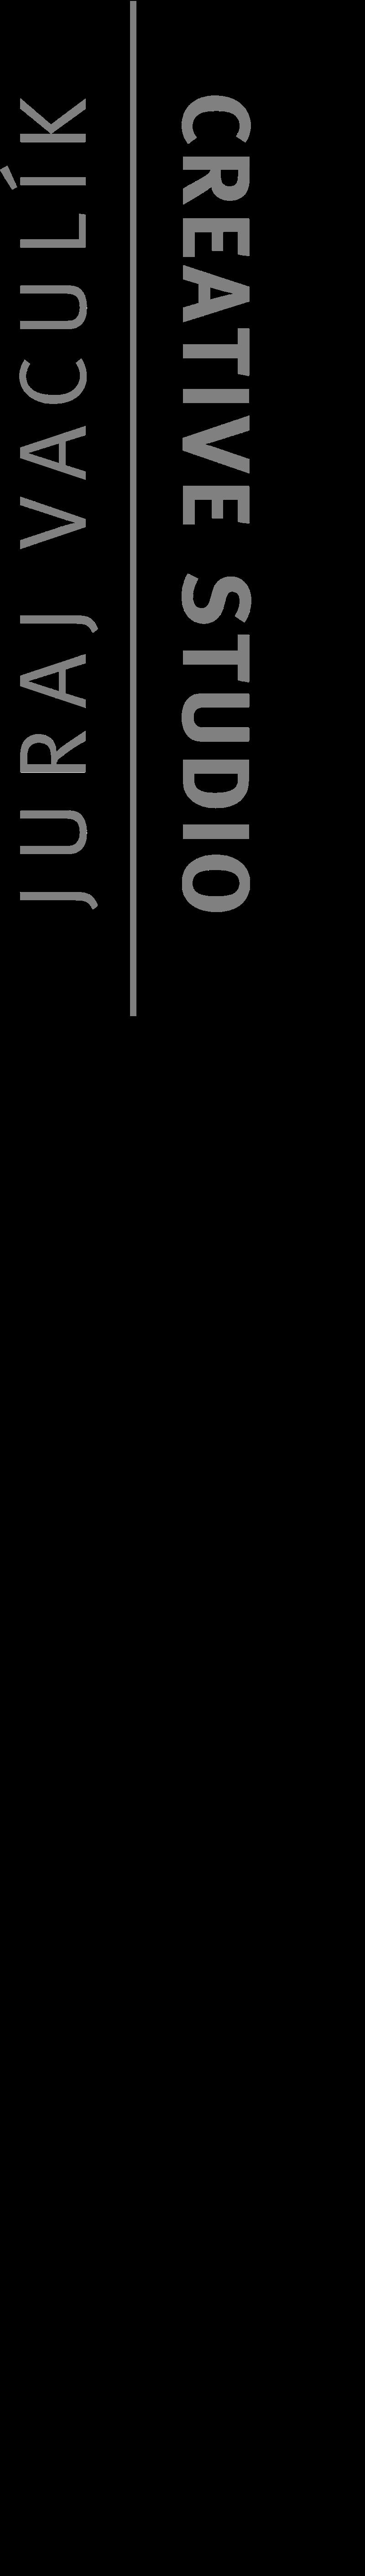 JVCS vector